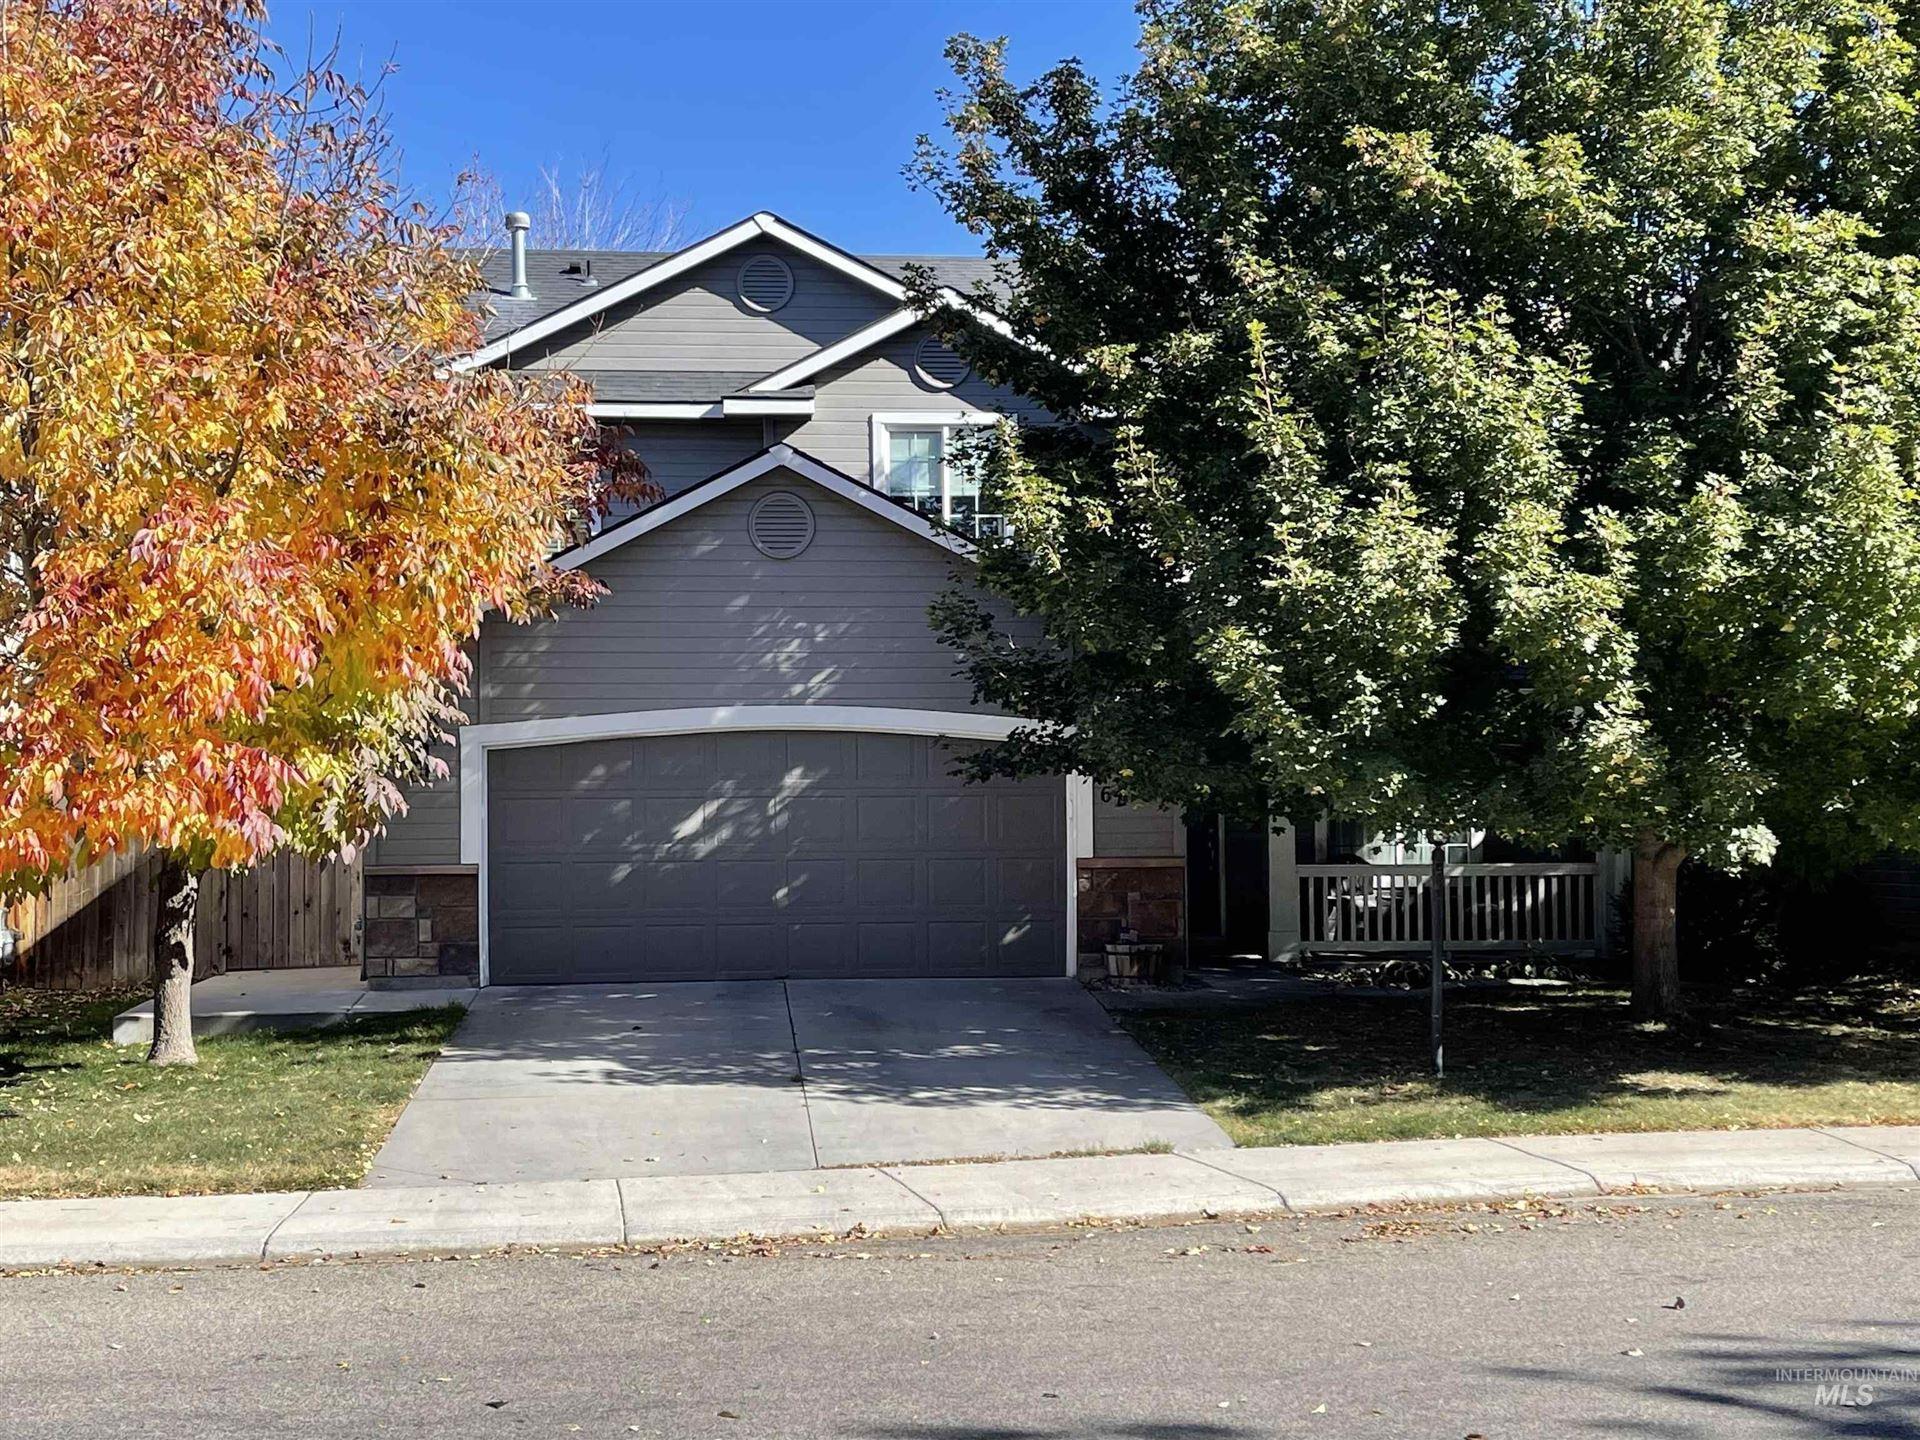 6440 South Cheshire Avenue, Boise, ID 83709 - MLS#: 98822779